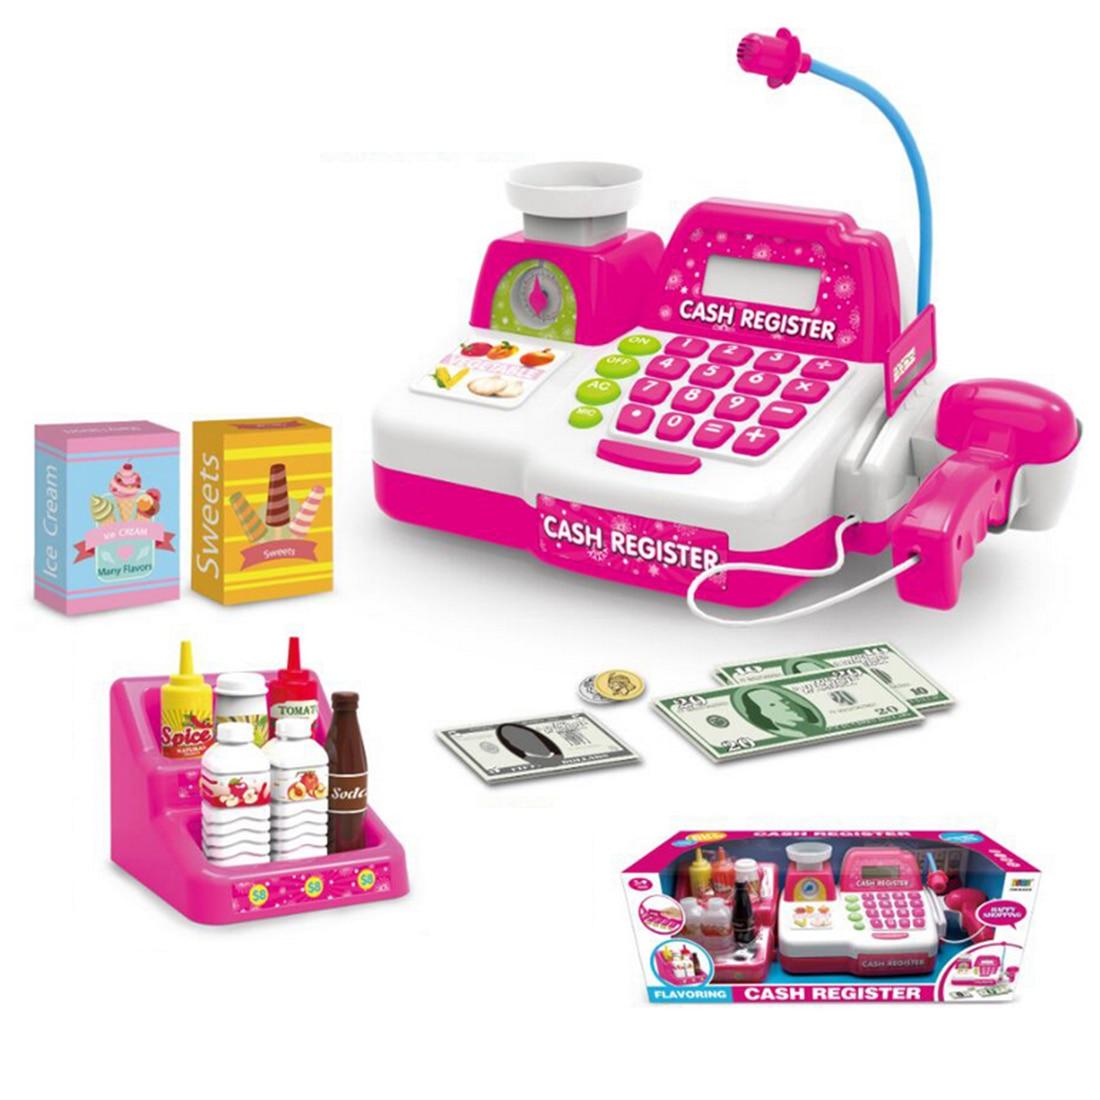 Emulational Plastic Cash Register Cashier Pretend & Play Children Early Development Educational Kid Toy цена